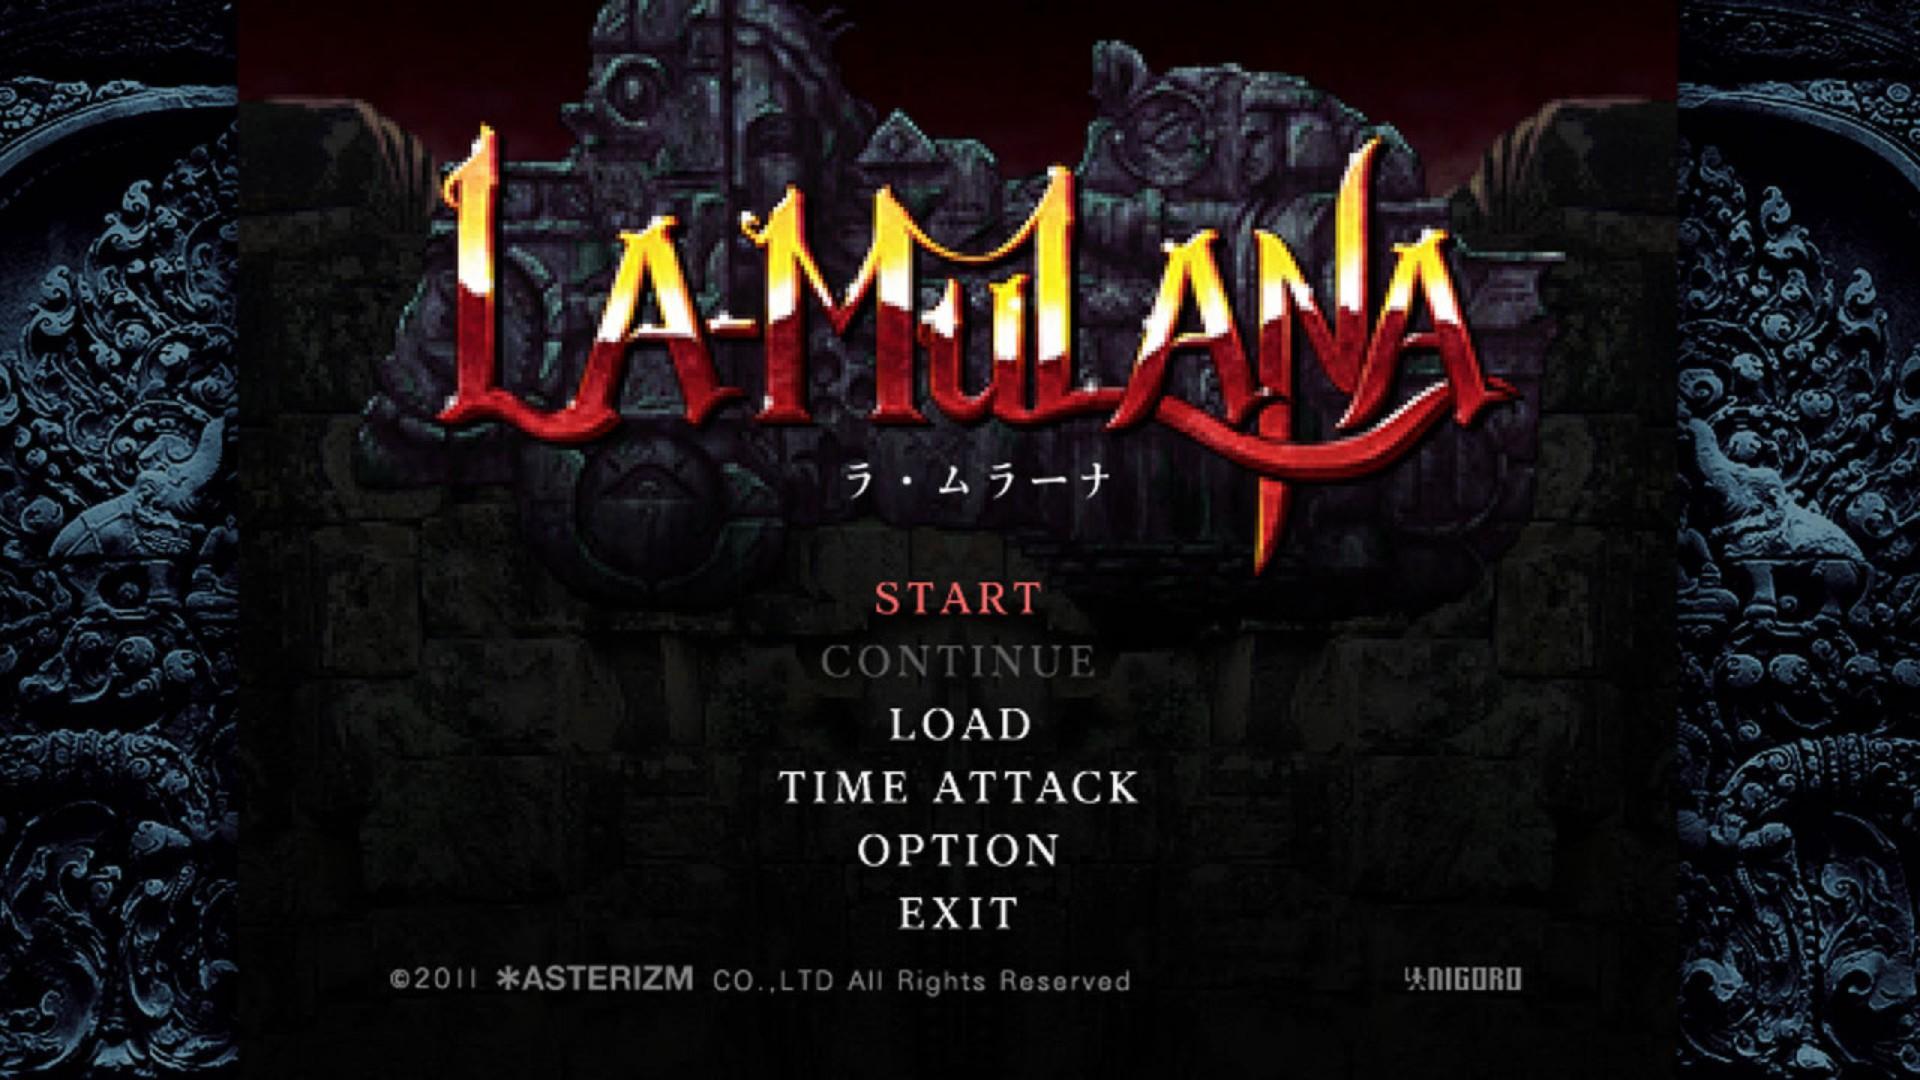 Find the best laptops for La-Mulana